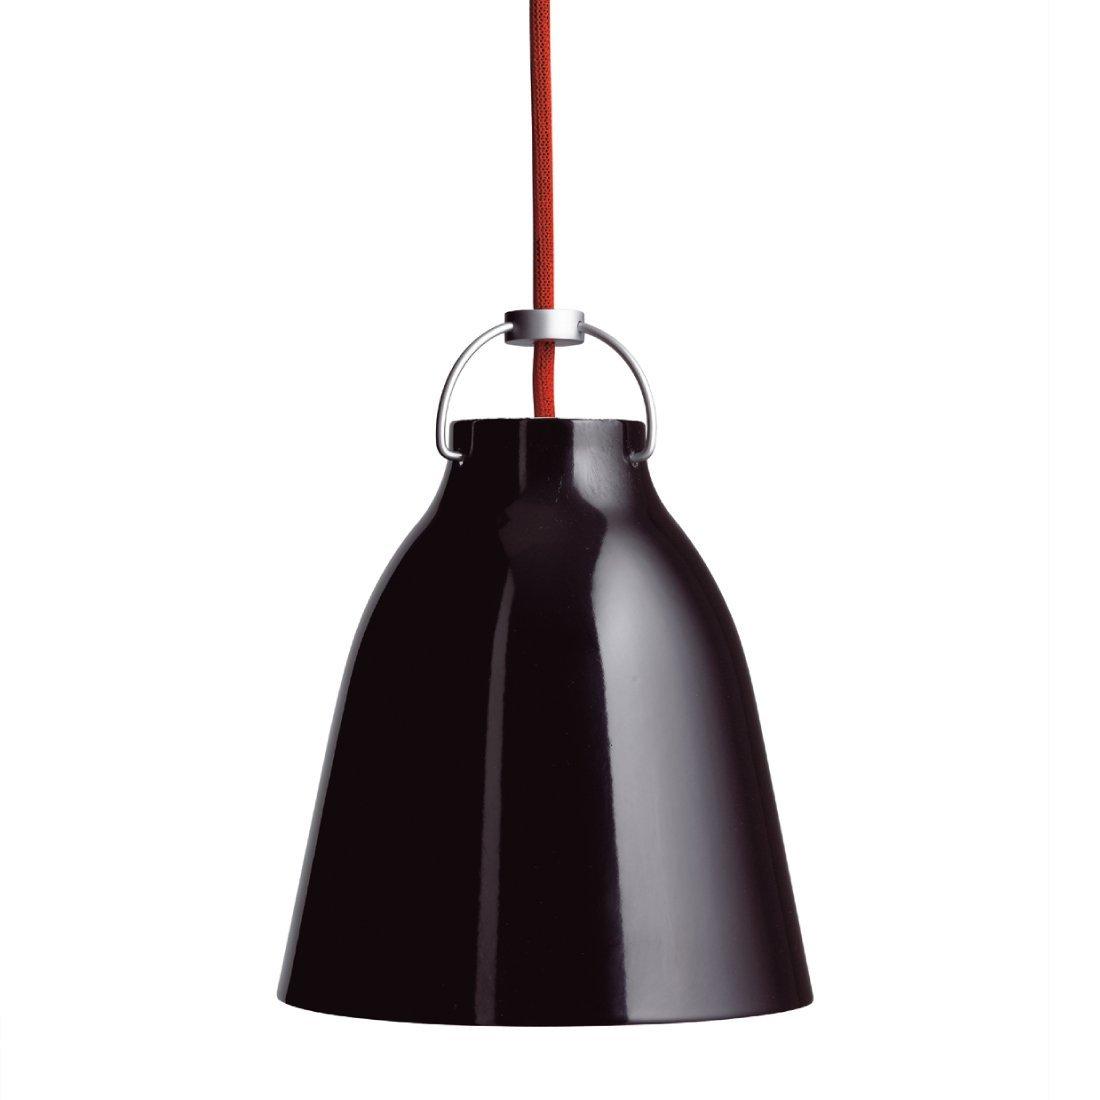 Lightyears Caravaggio P1 Hoogglans Zwart - Rood